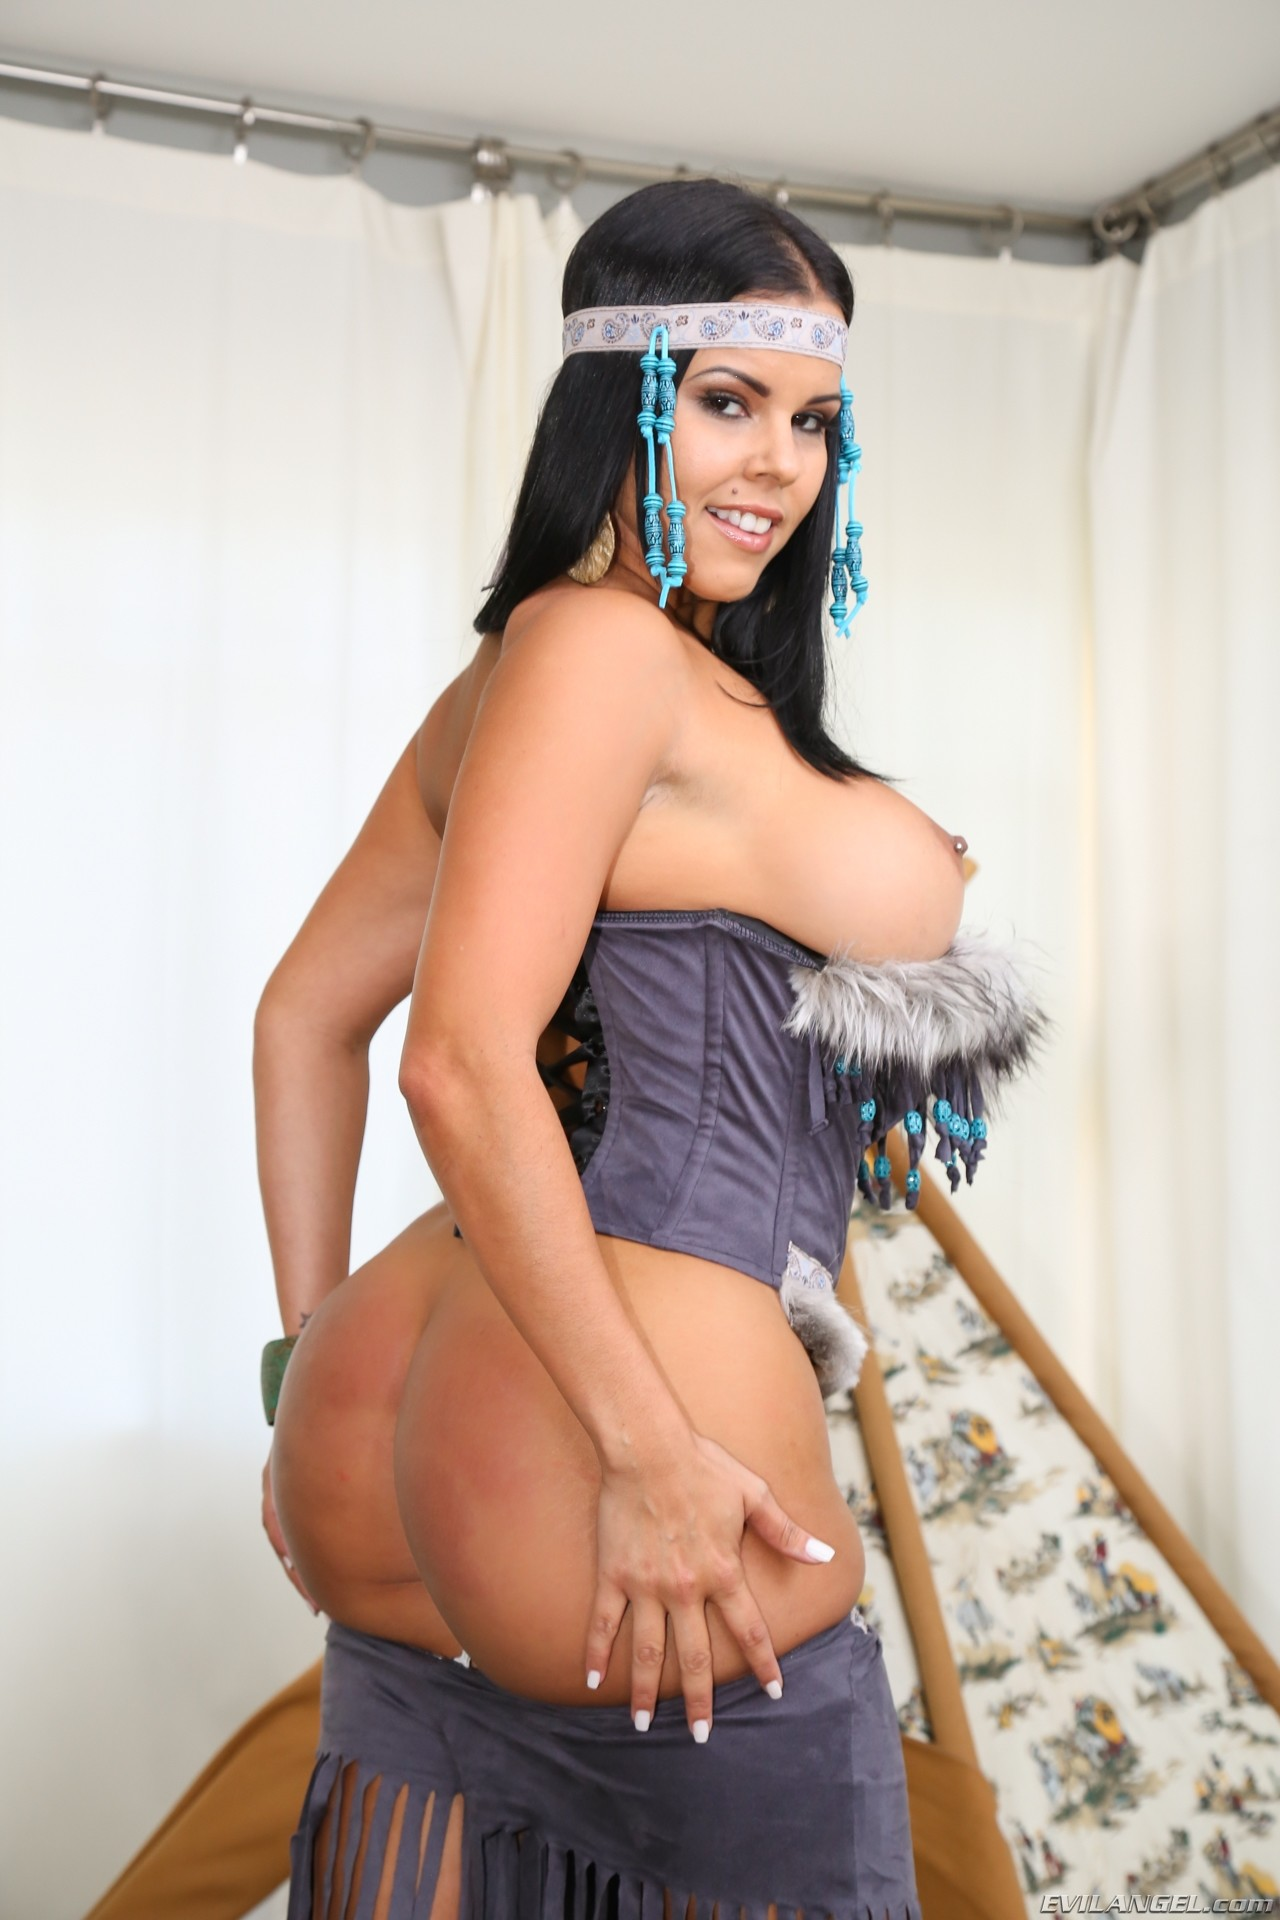 Brazzers busty bigbooty milf lisa ann fucks her masseur - 1 6